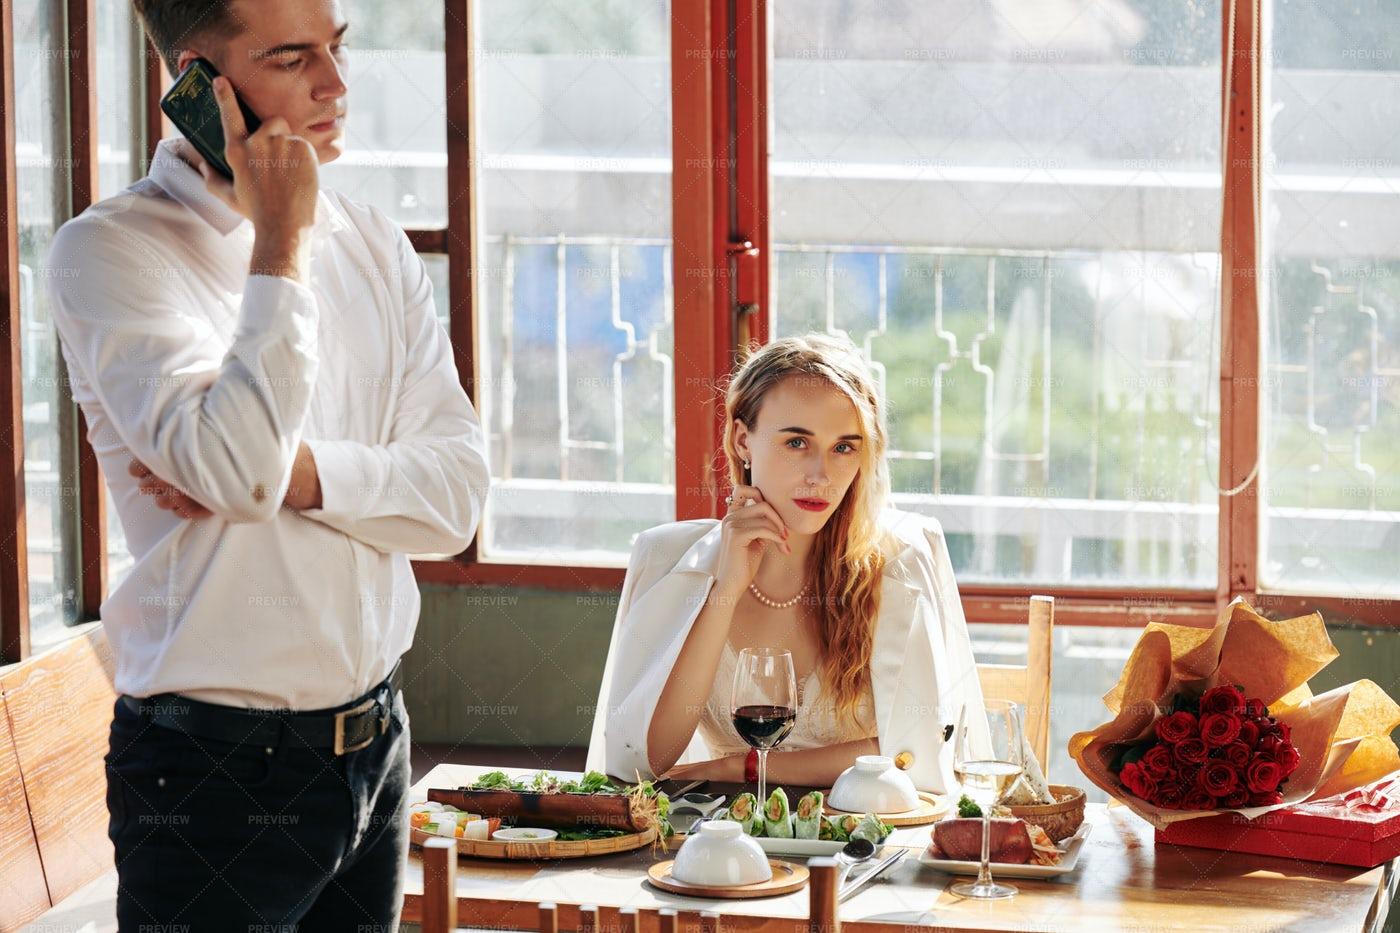 Gorgeous Woman At Table: Stock Photos